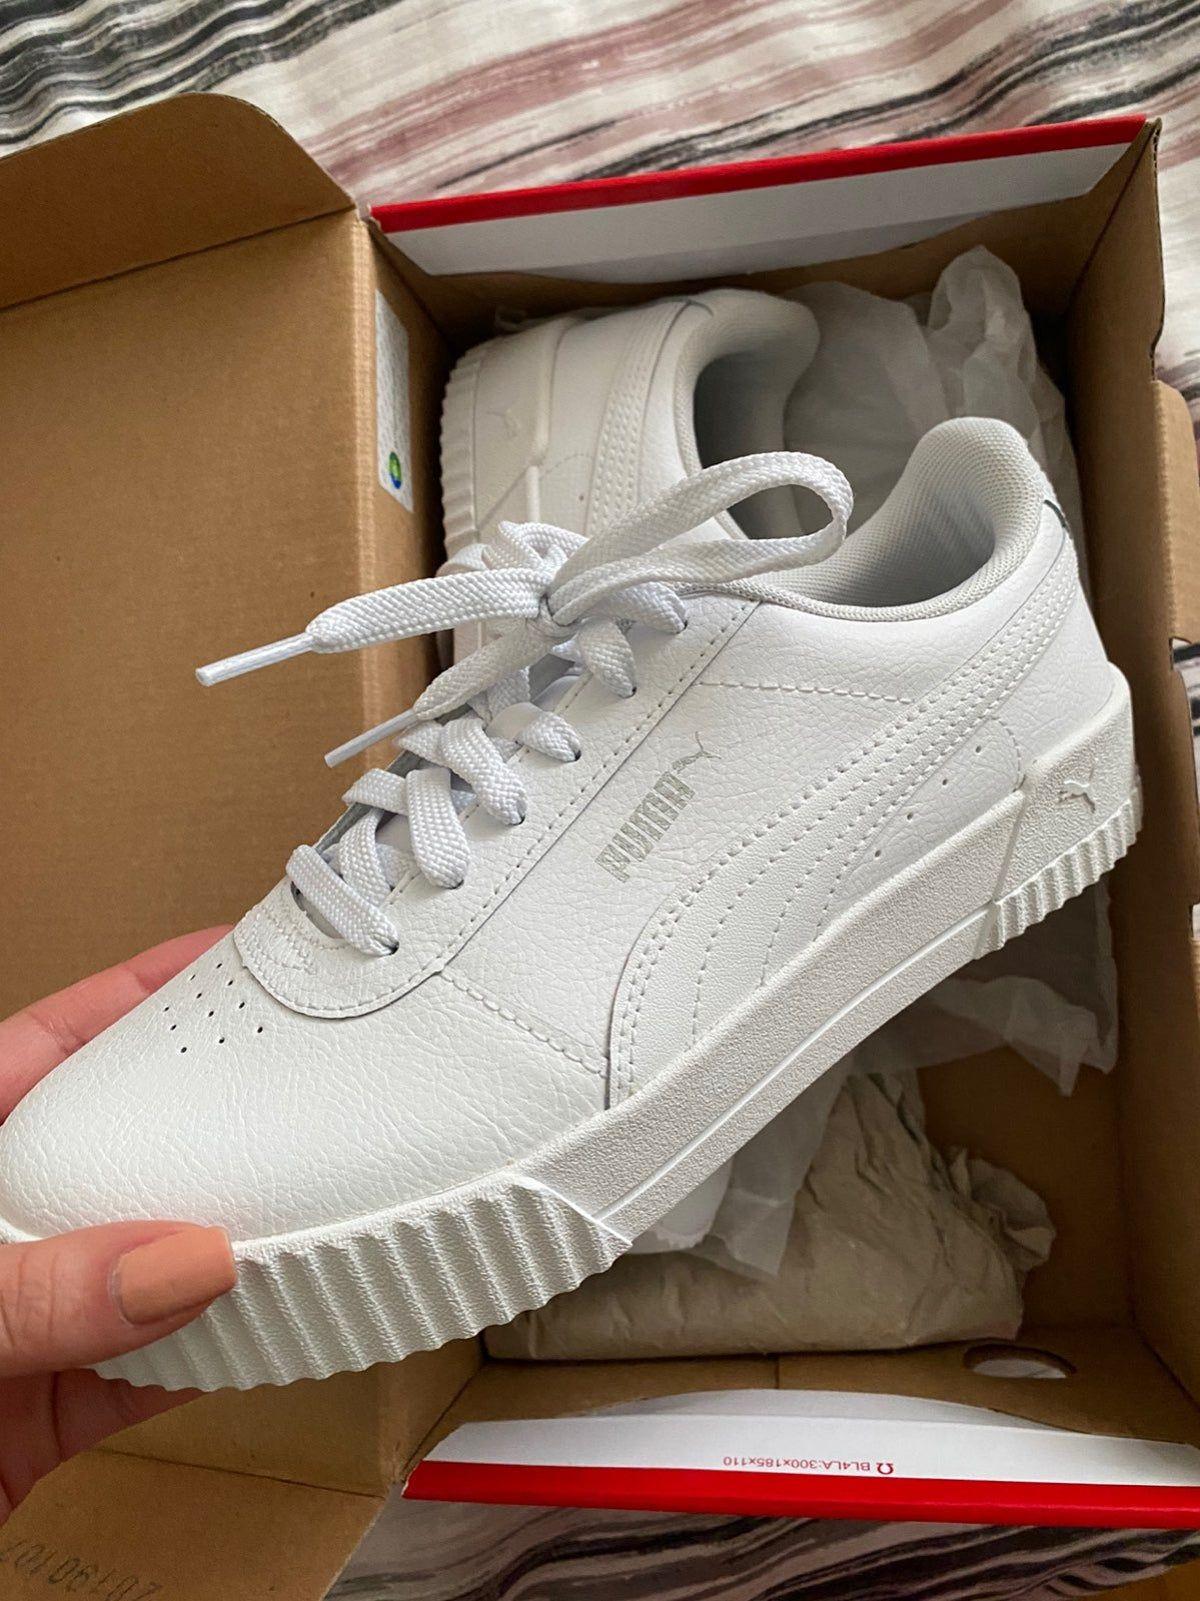 puma carina l white shoes in 2020 | Basic shoes wardrobe ...